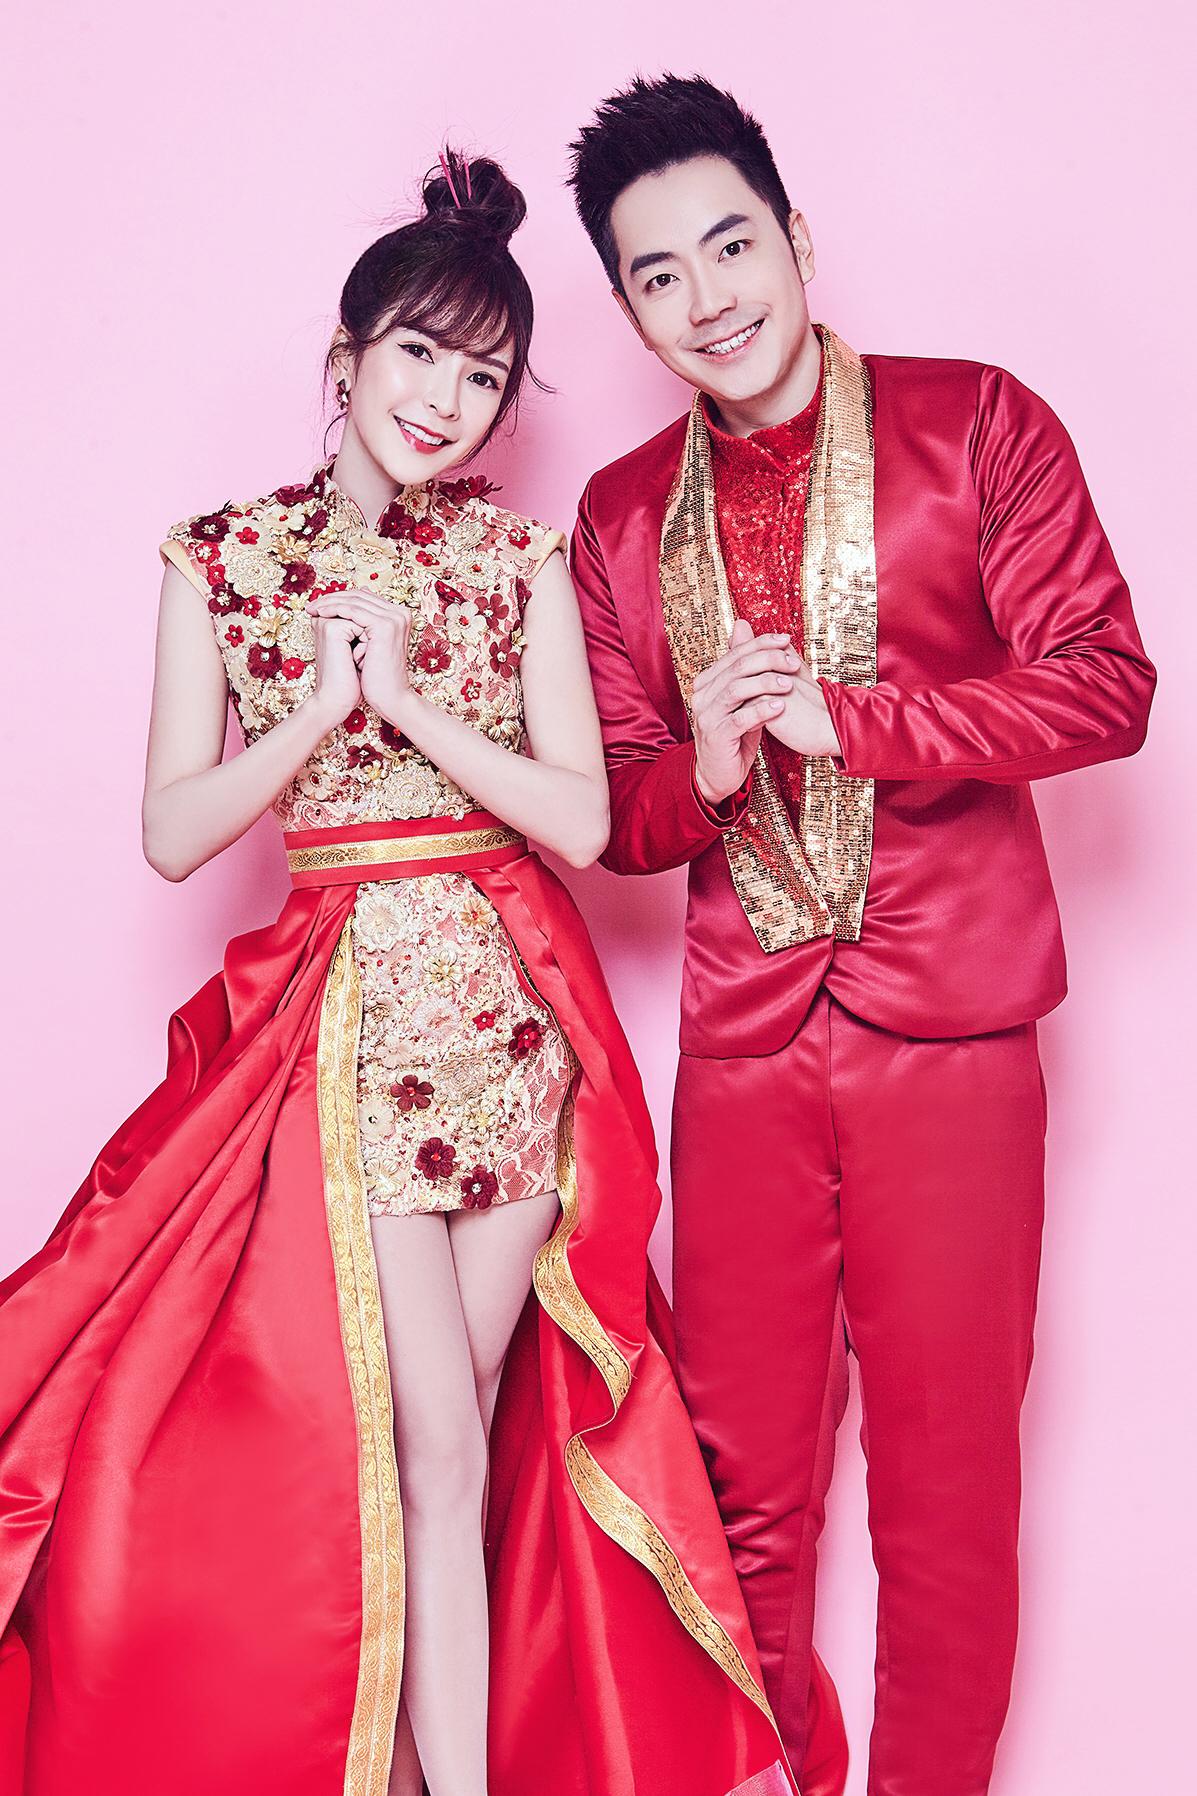 Stella Chung and Nick Chung both in custom-made costume